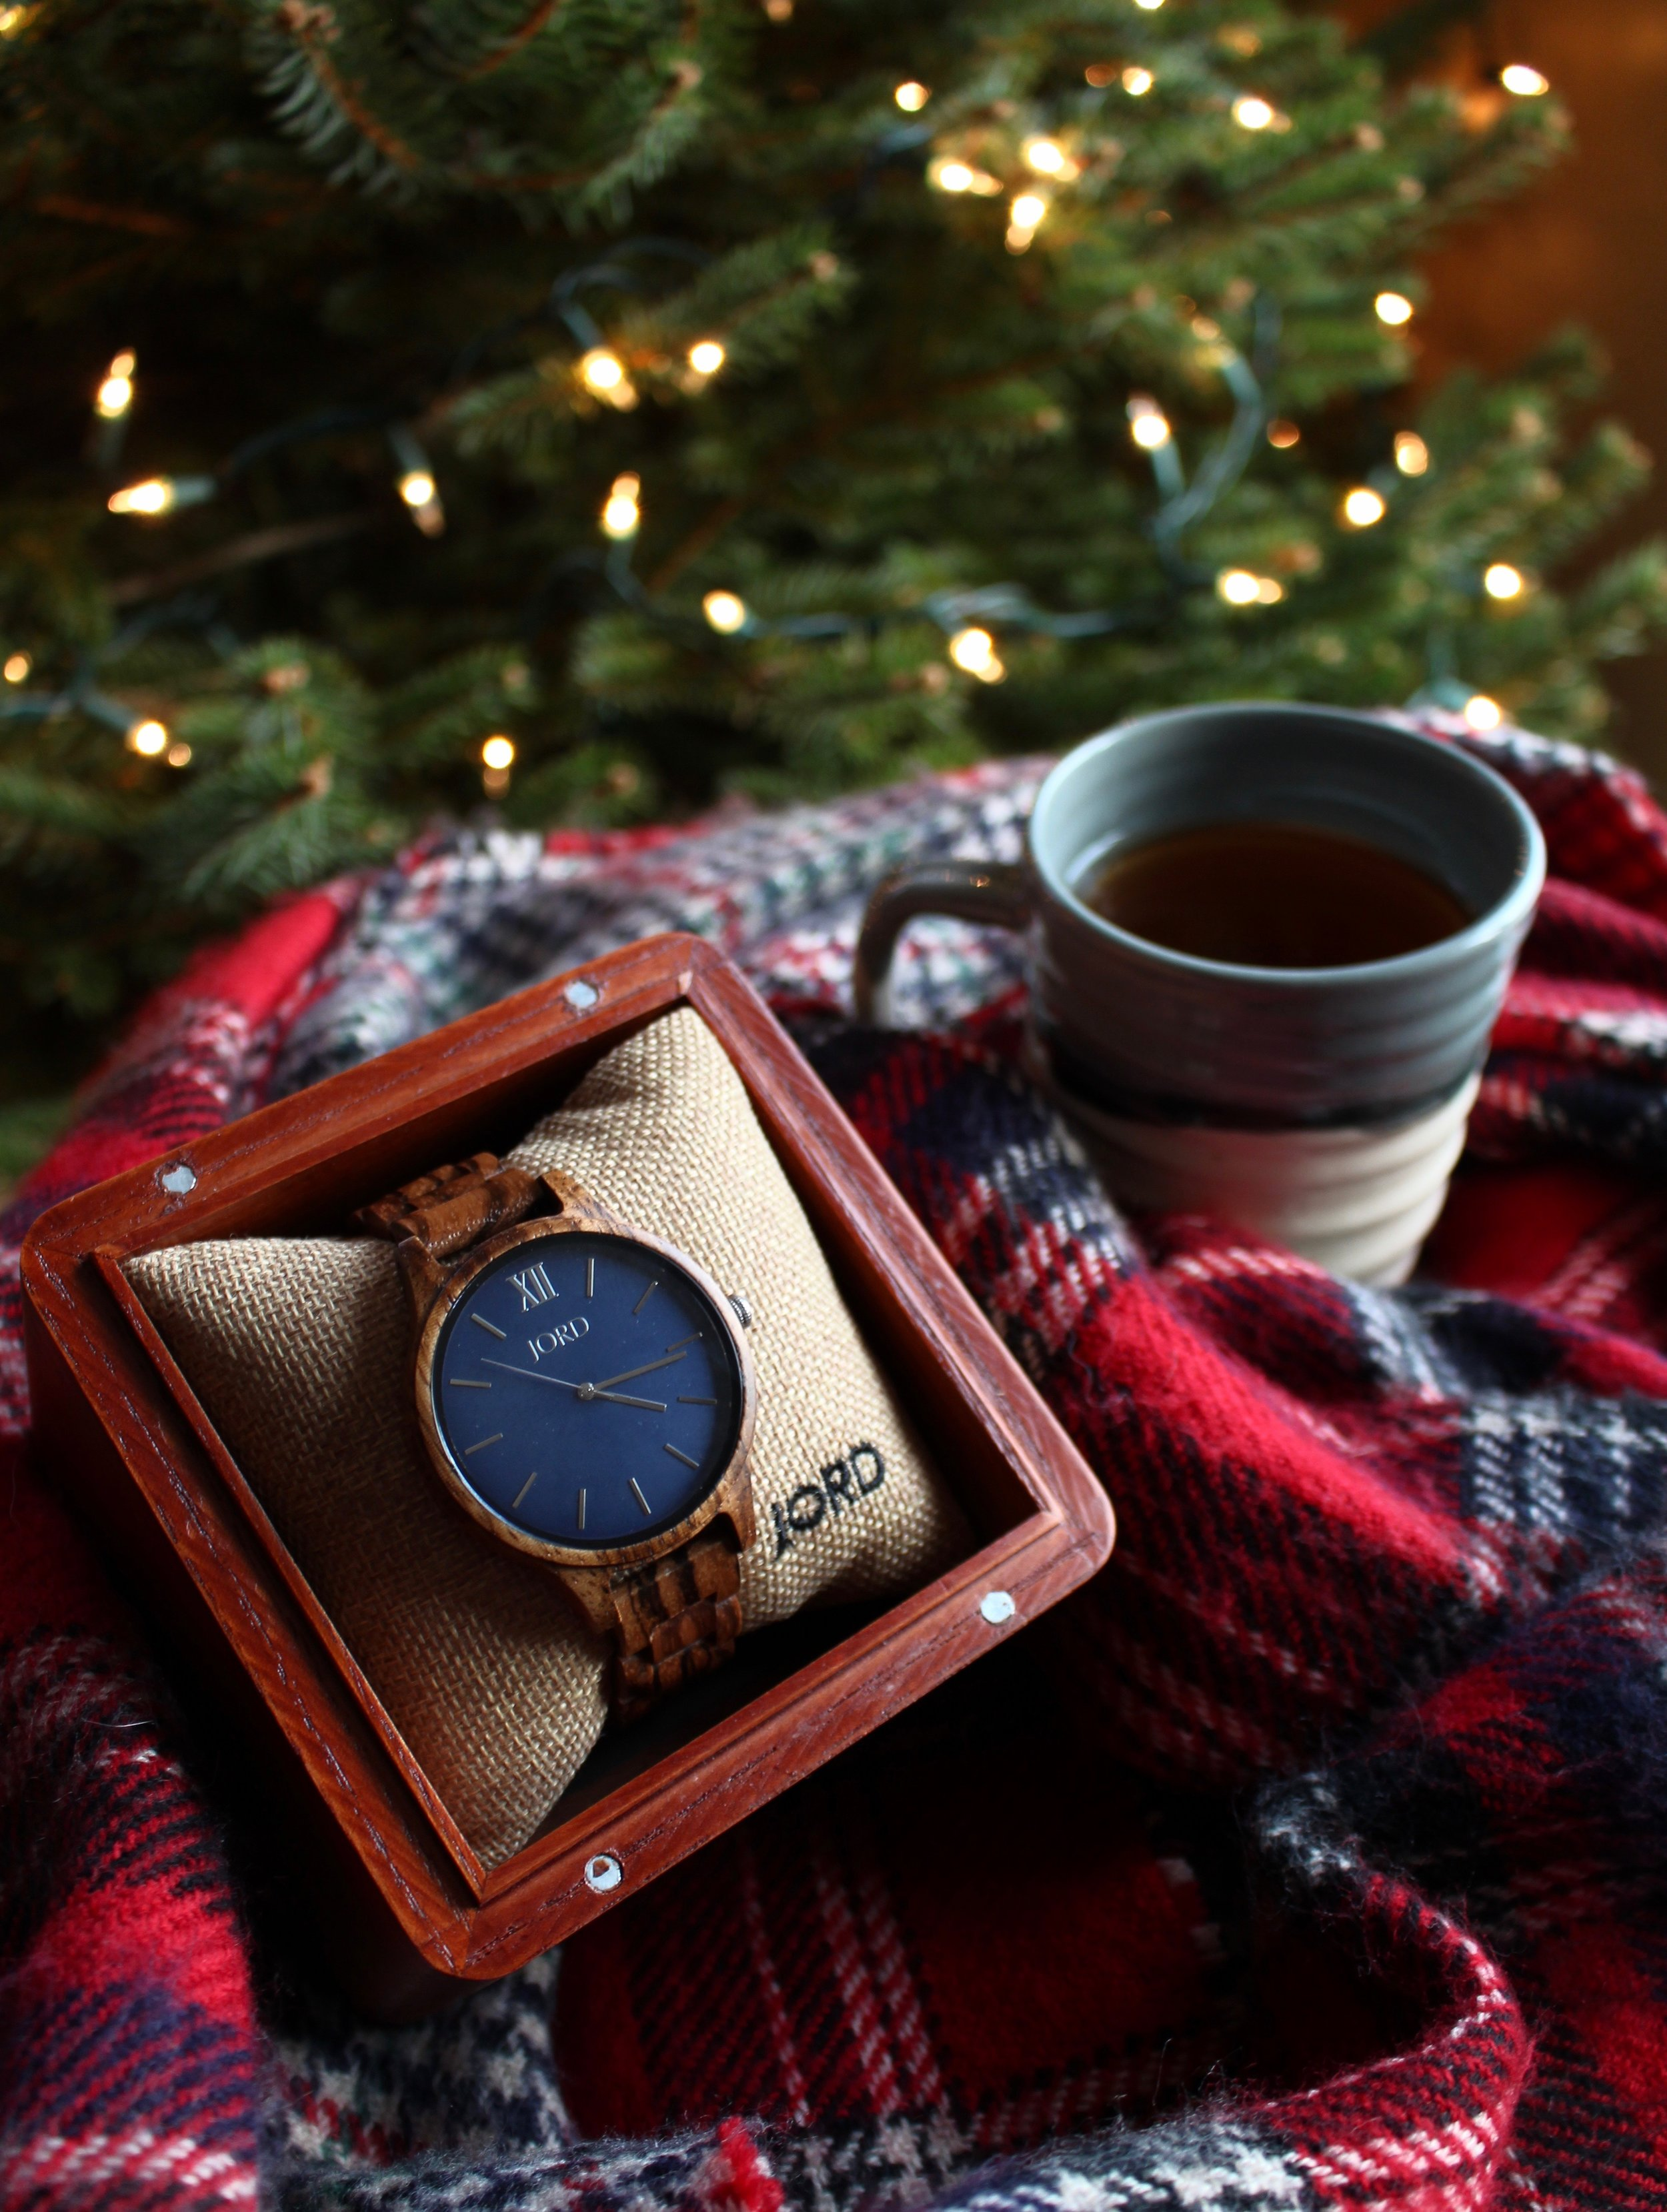 "<!-- JORD WOOD WATCHES ARTICLE WIDGET START -->  <a id=""woodwatches_com_widget_article"" ishidden=""1"" title=""Luxury Wooden Watch"">Luxury Wooden Watch</a>  <script src=""// www.woodwatches.com/widget-article/createnplate "" type=""text/javascript""></script>  <!-- JORD WOOD WATCHES ARTICLE WIDGET END -->"